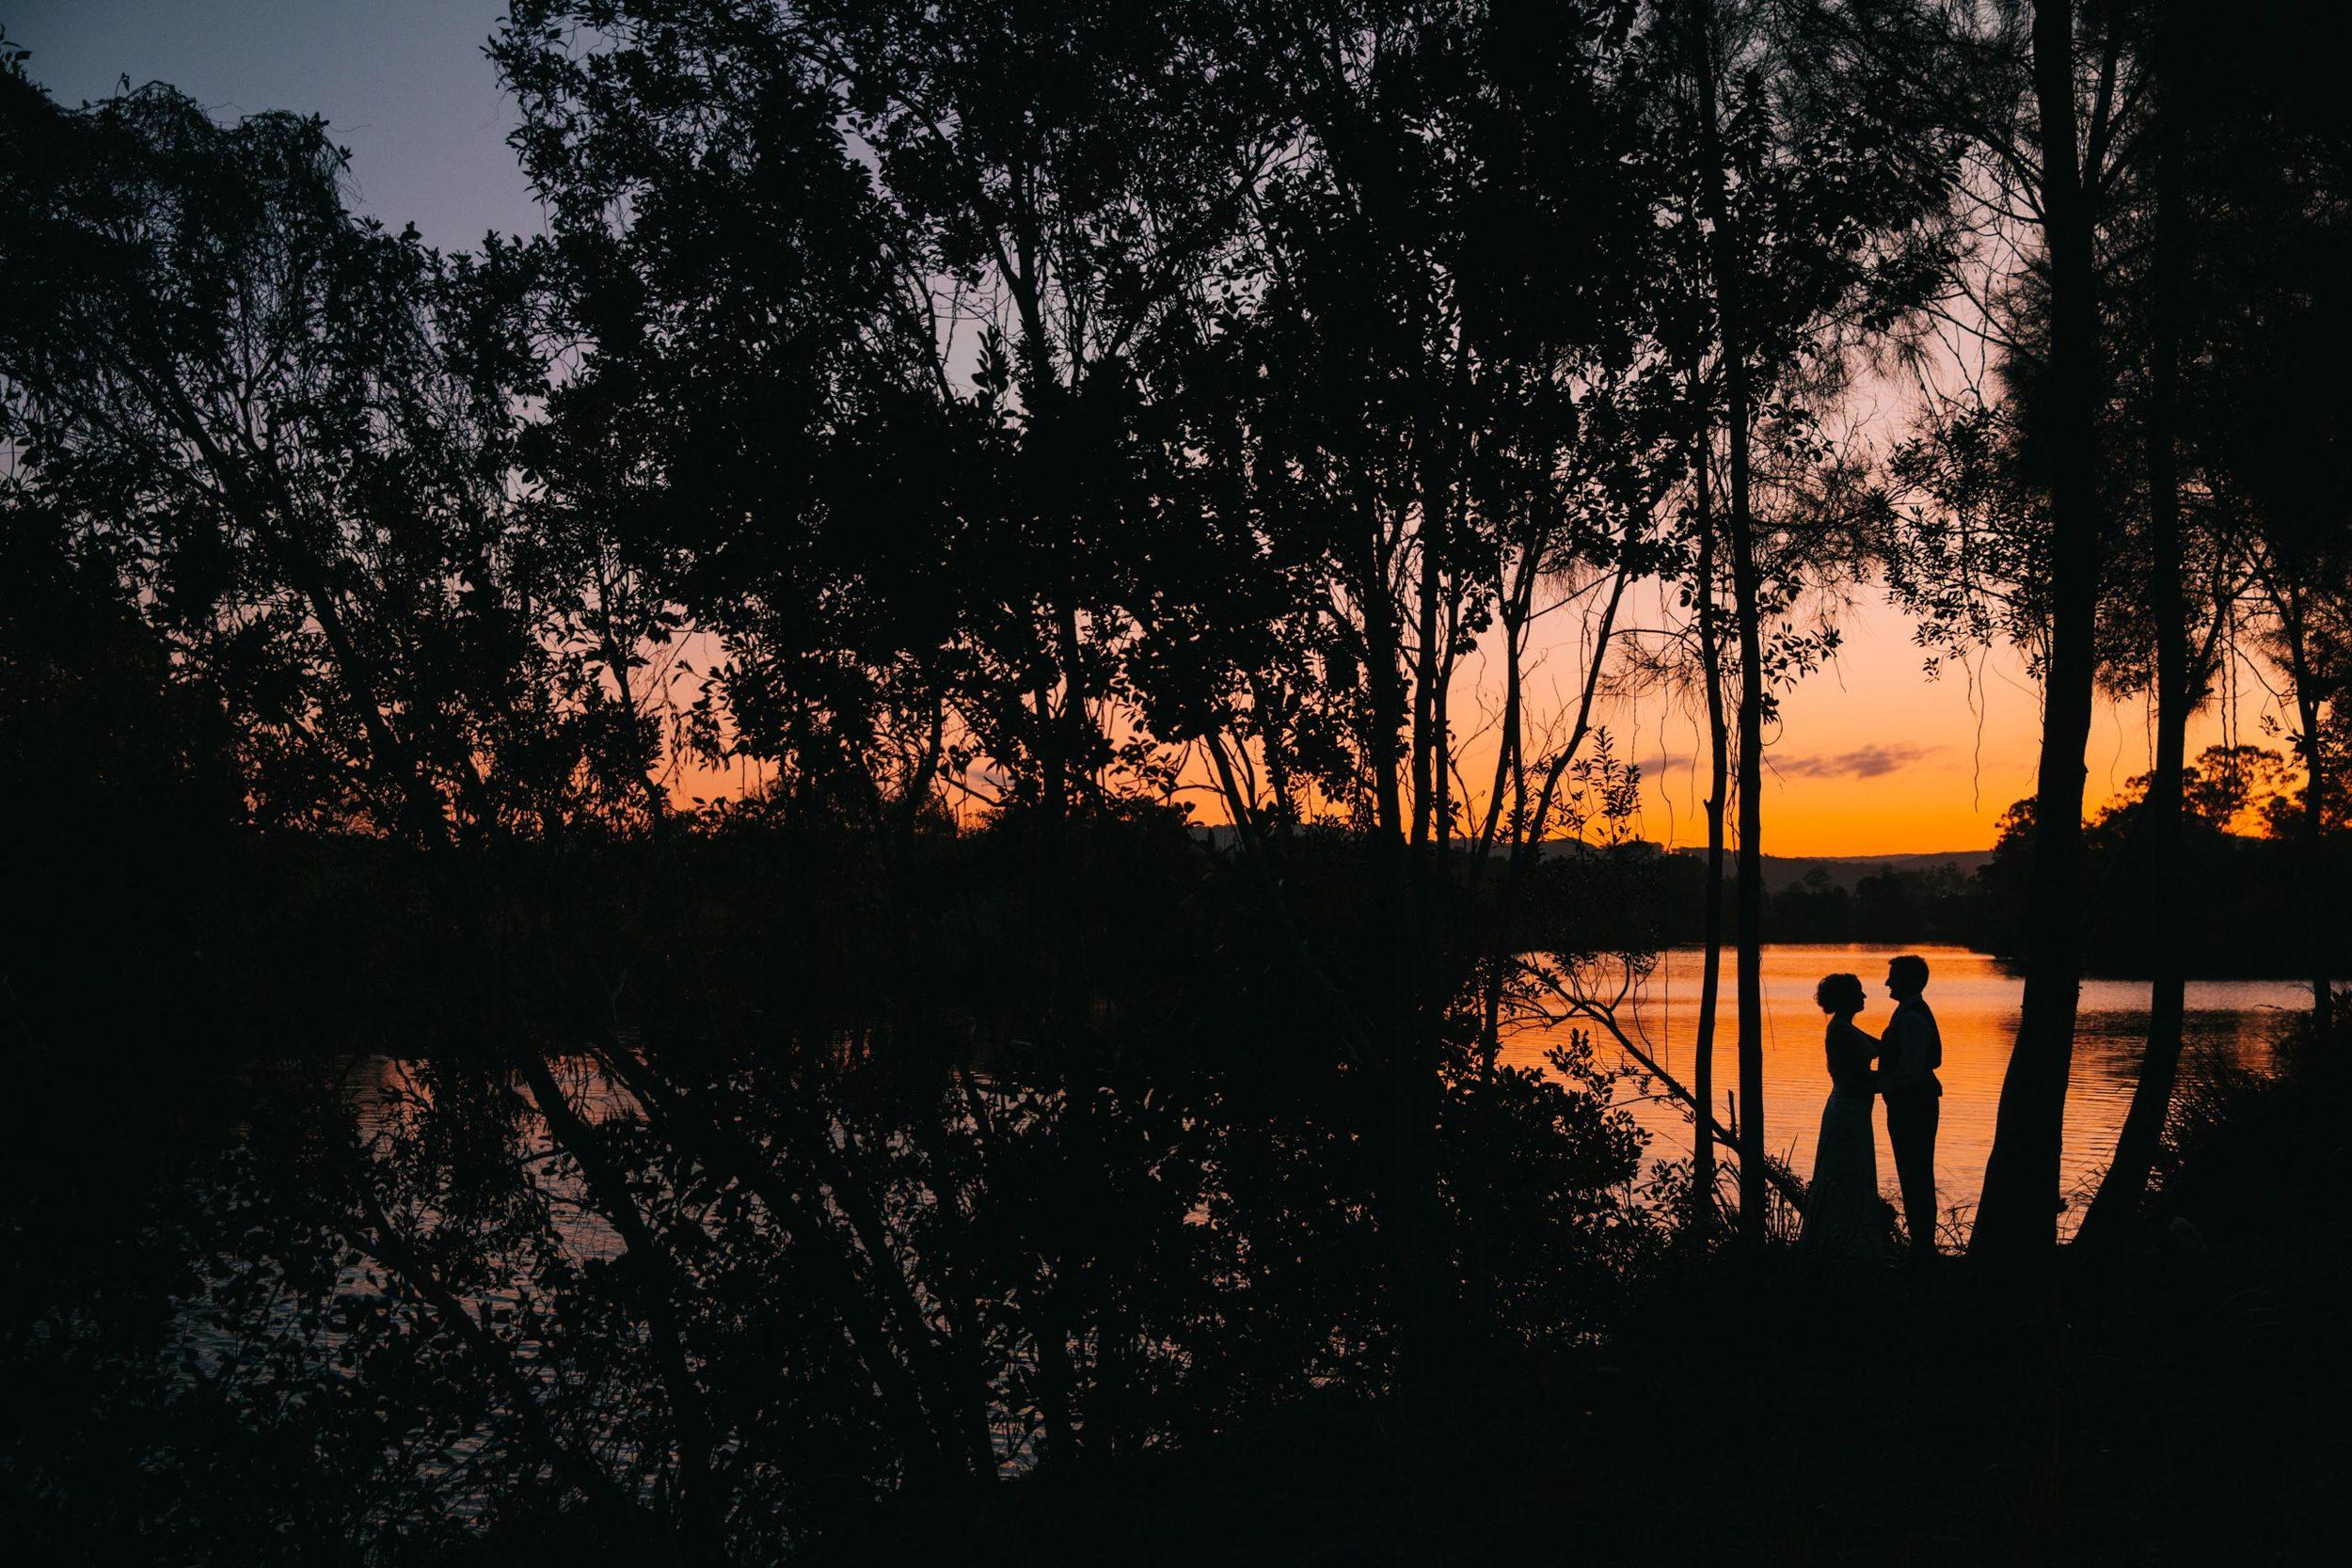 sunshine-coast-wedding-photographer-mooloolaba-maroochydore-maleny-montville-flaxton-noosa-hinterland-caloundra-destination-elopement-photos-best-eco-friendly-0854.jpg